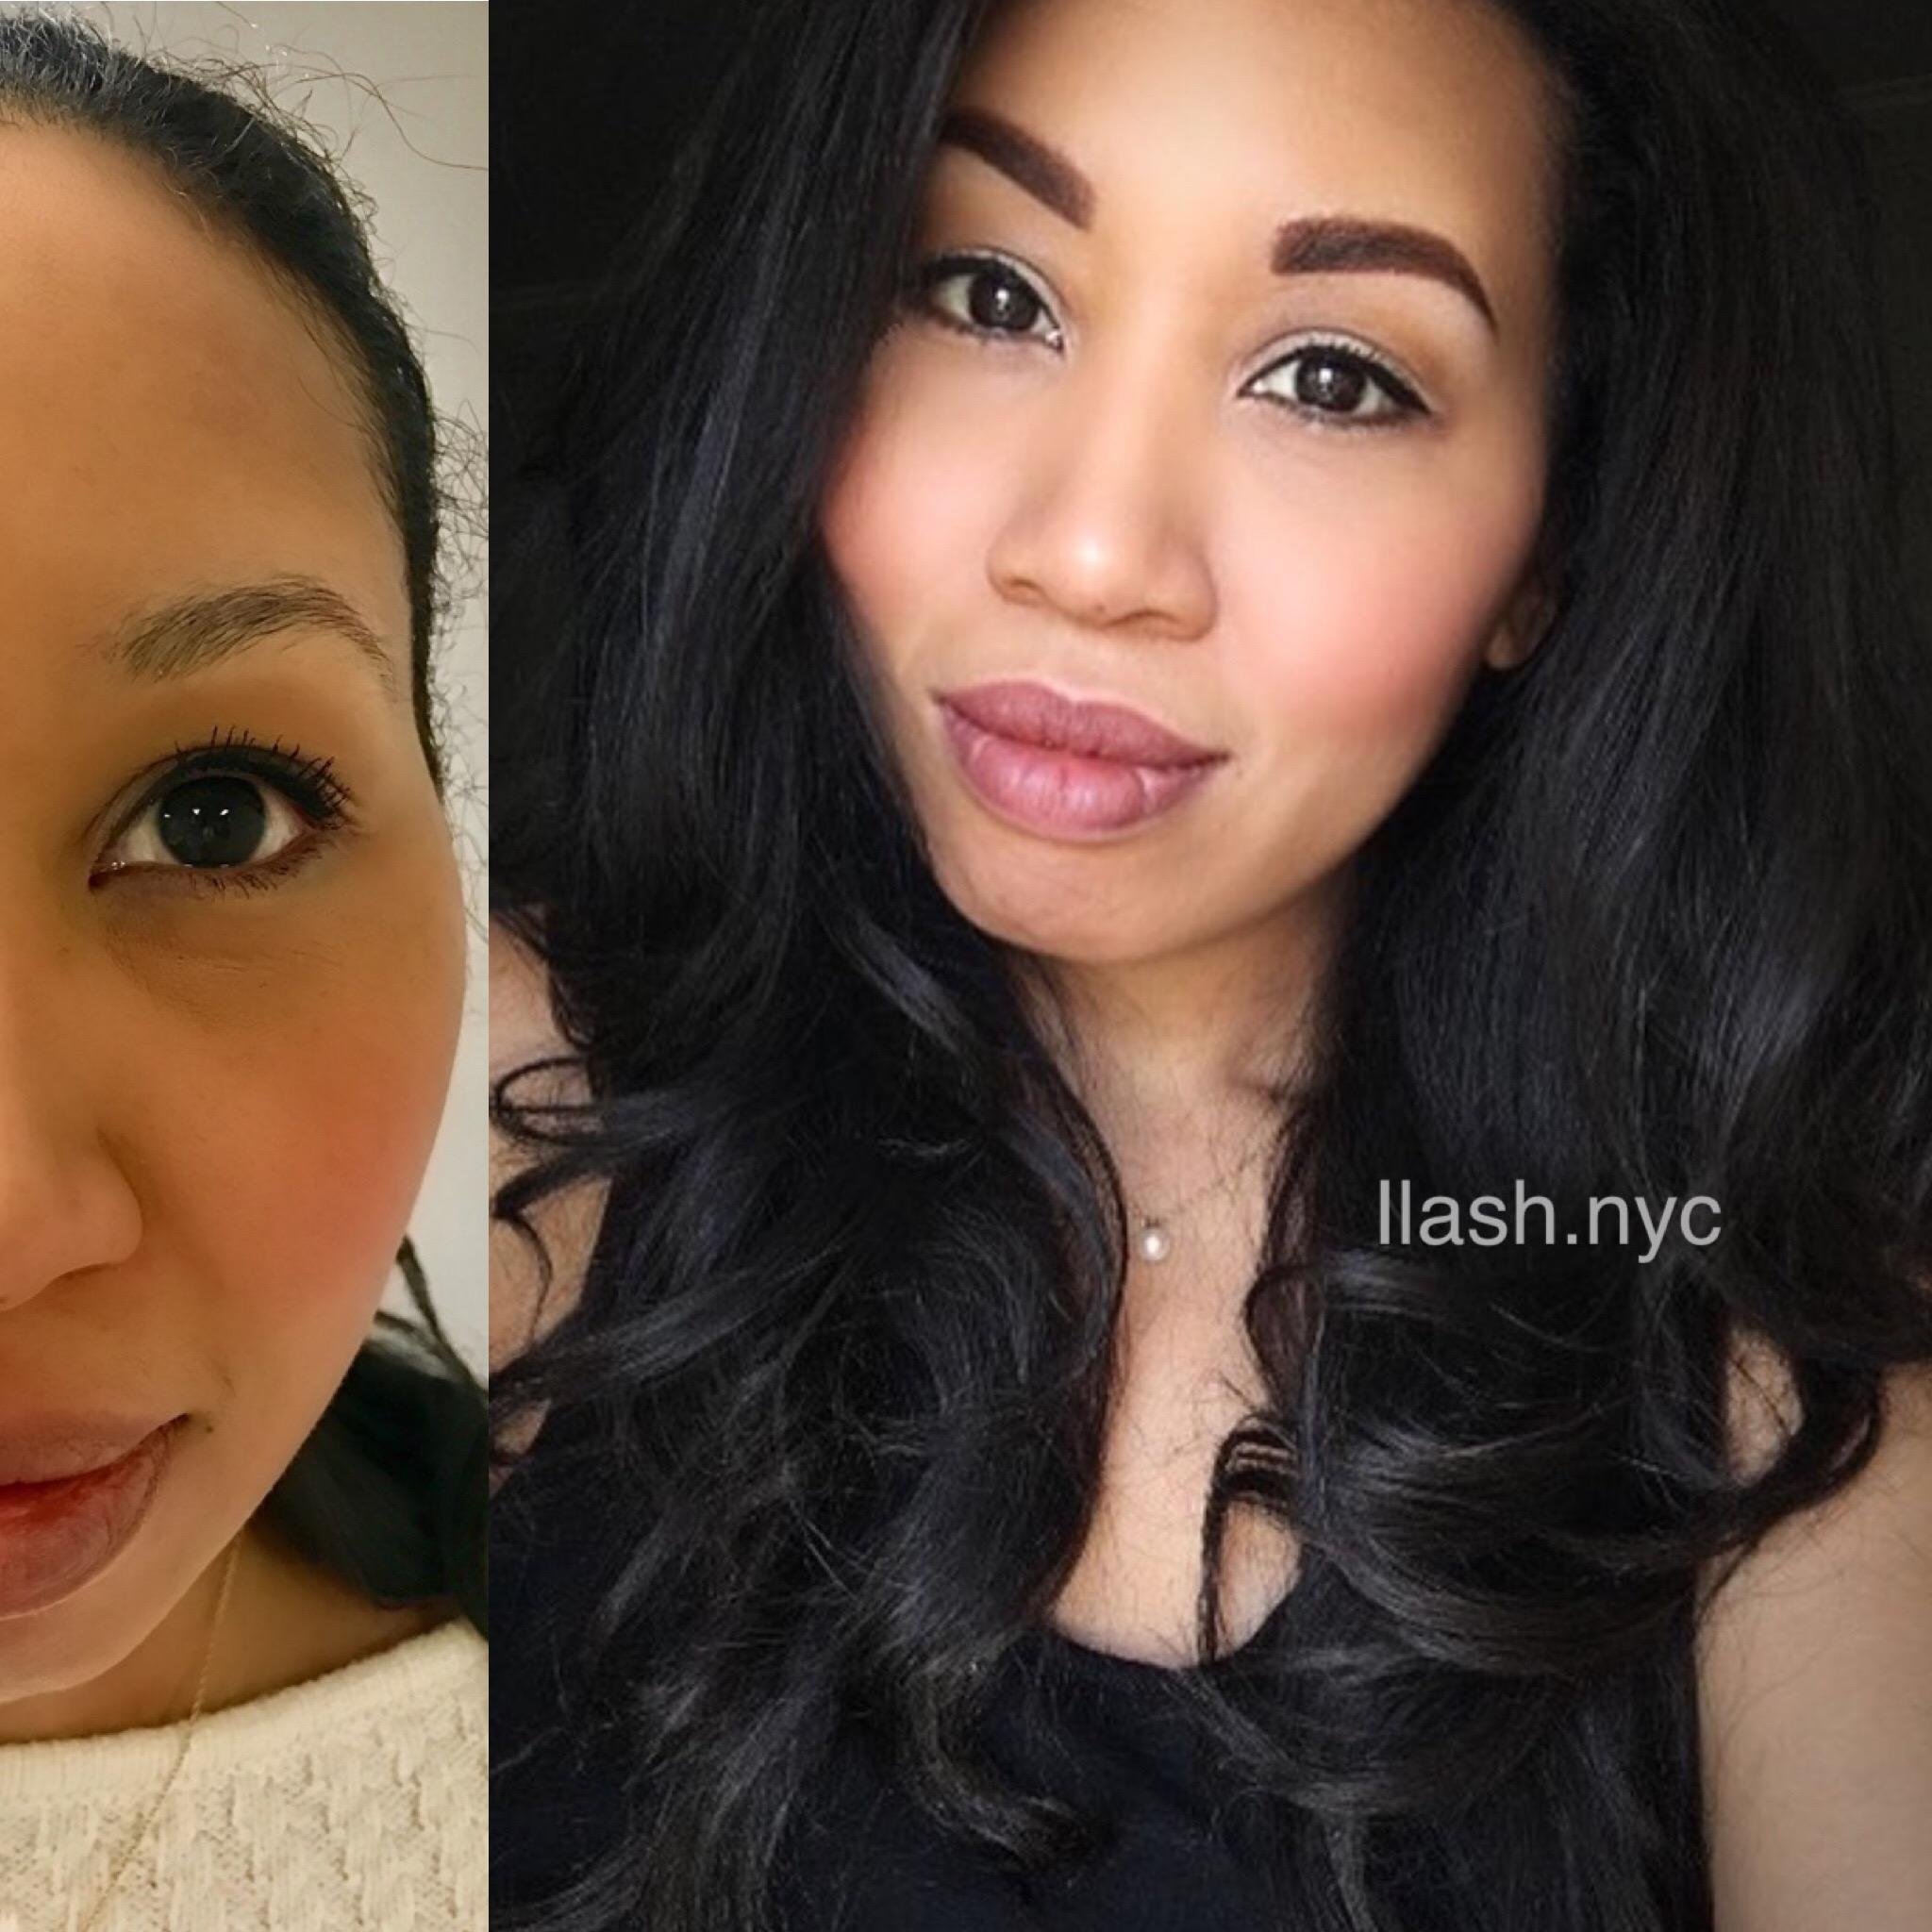 iLash Training NYC | Certified Eyelash Extension Training in